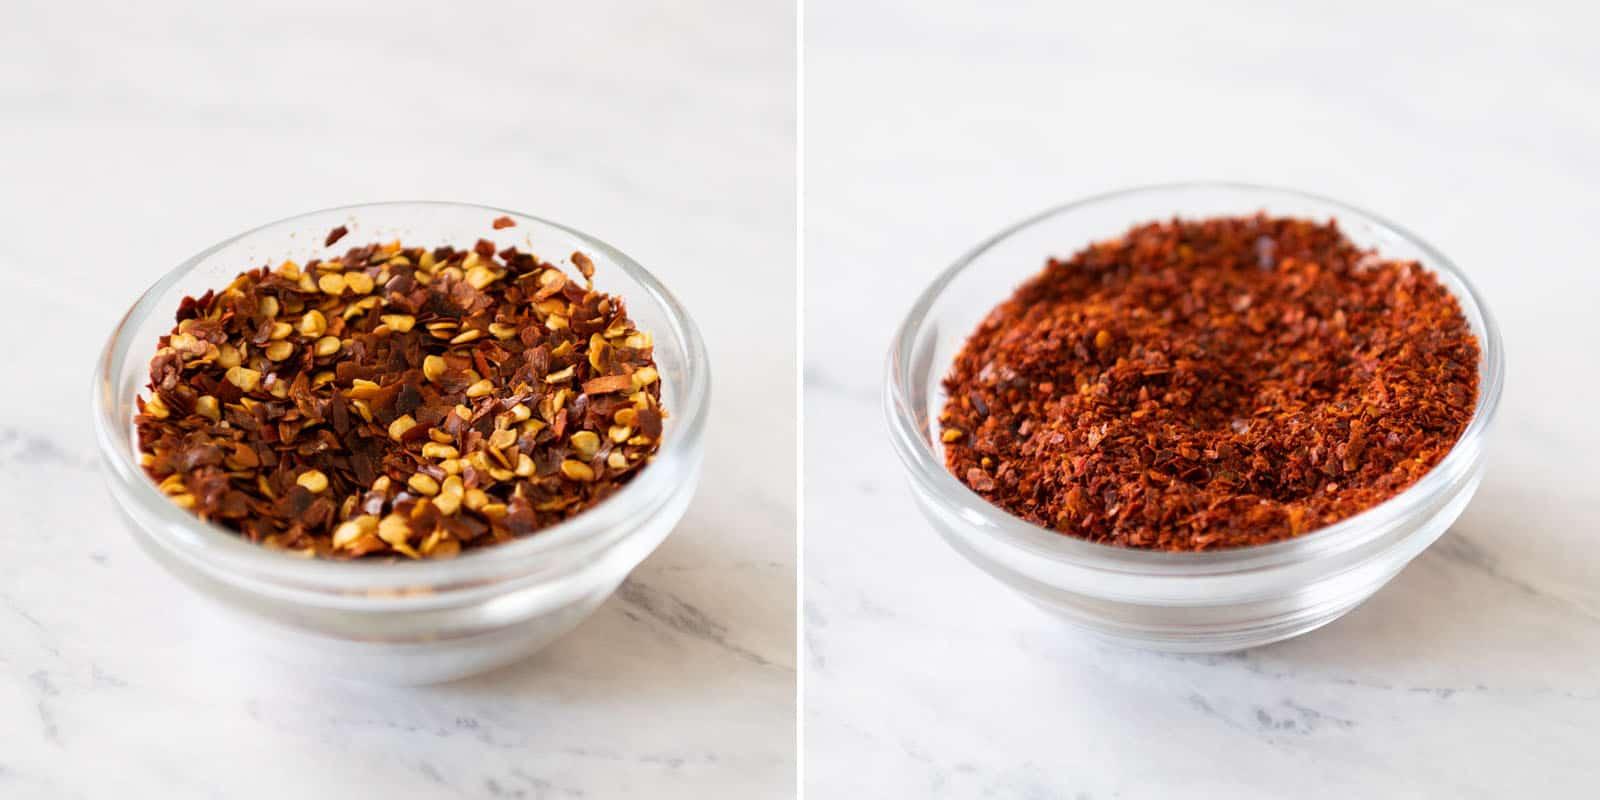 Red pepper flakes and gochugaru (Korean red pepper flakes)